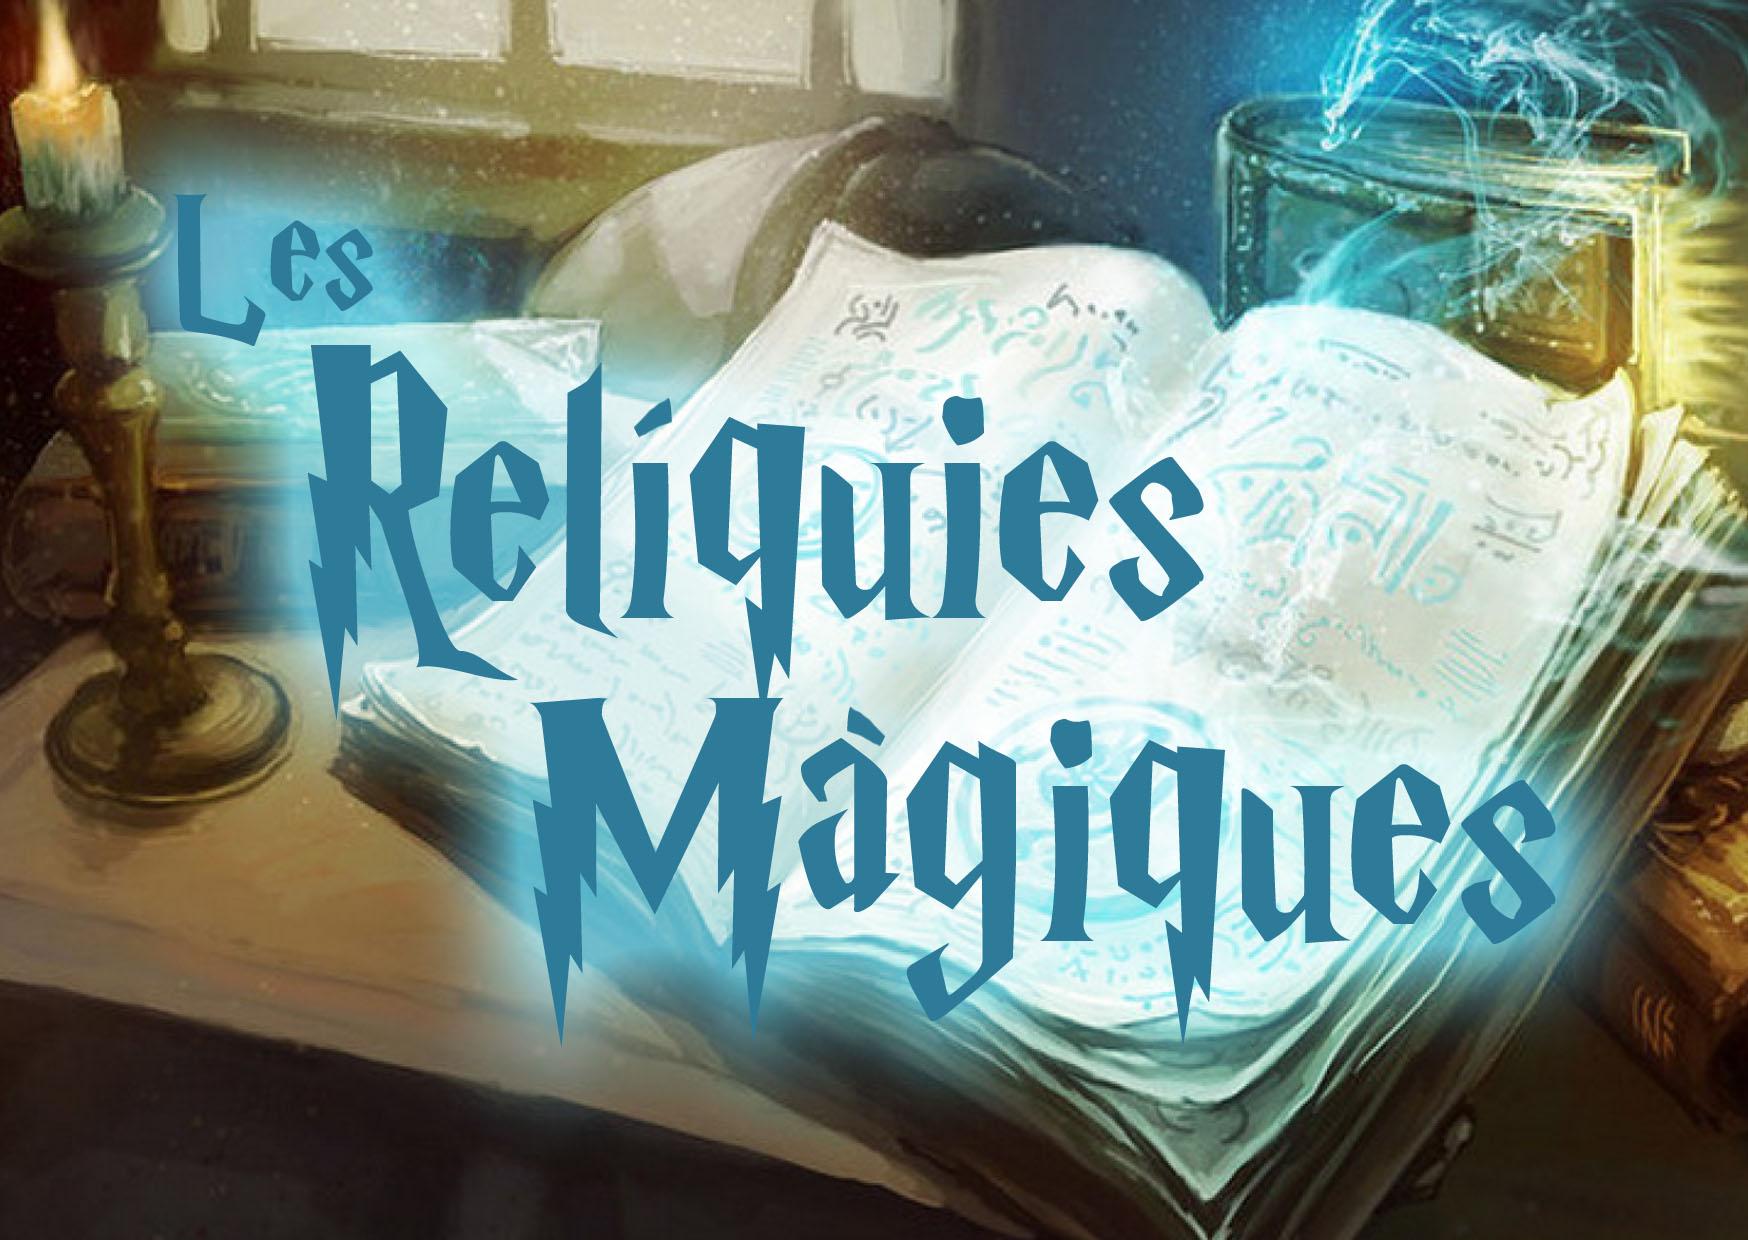 Las reliquias mágicas